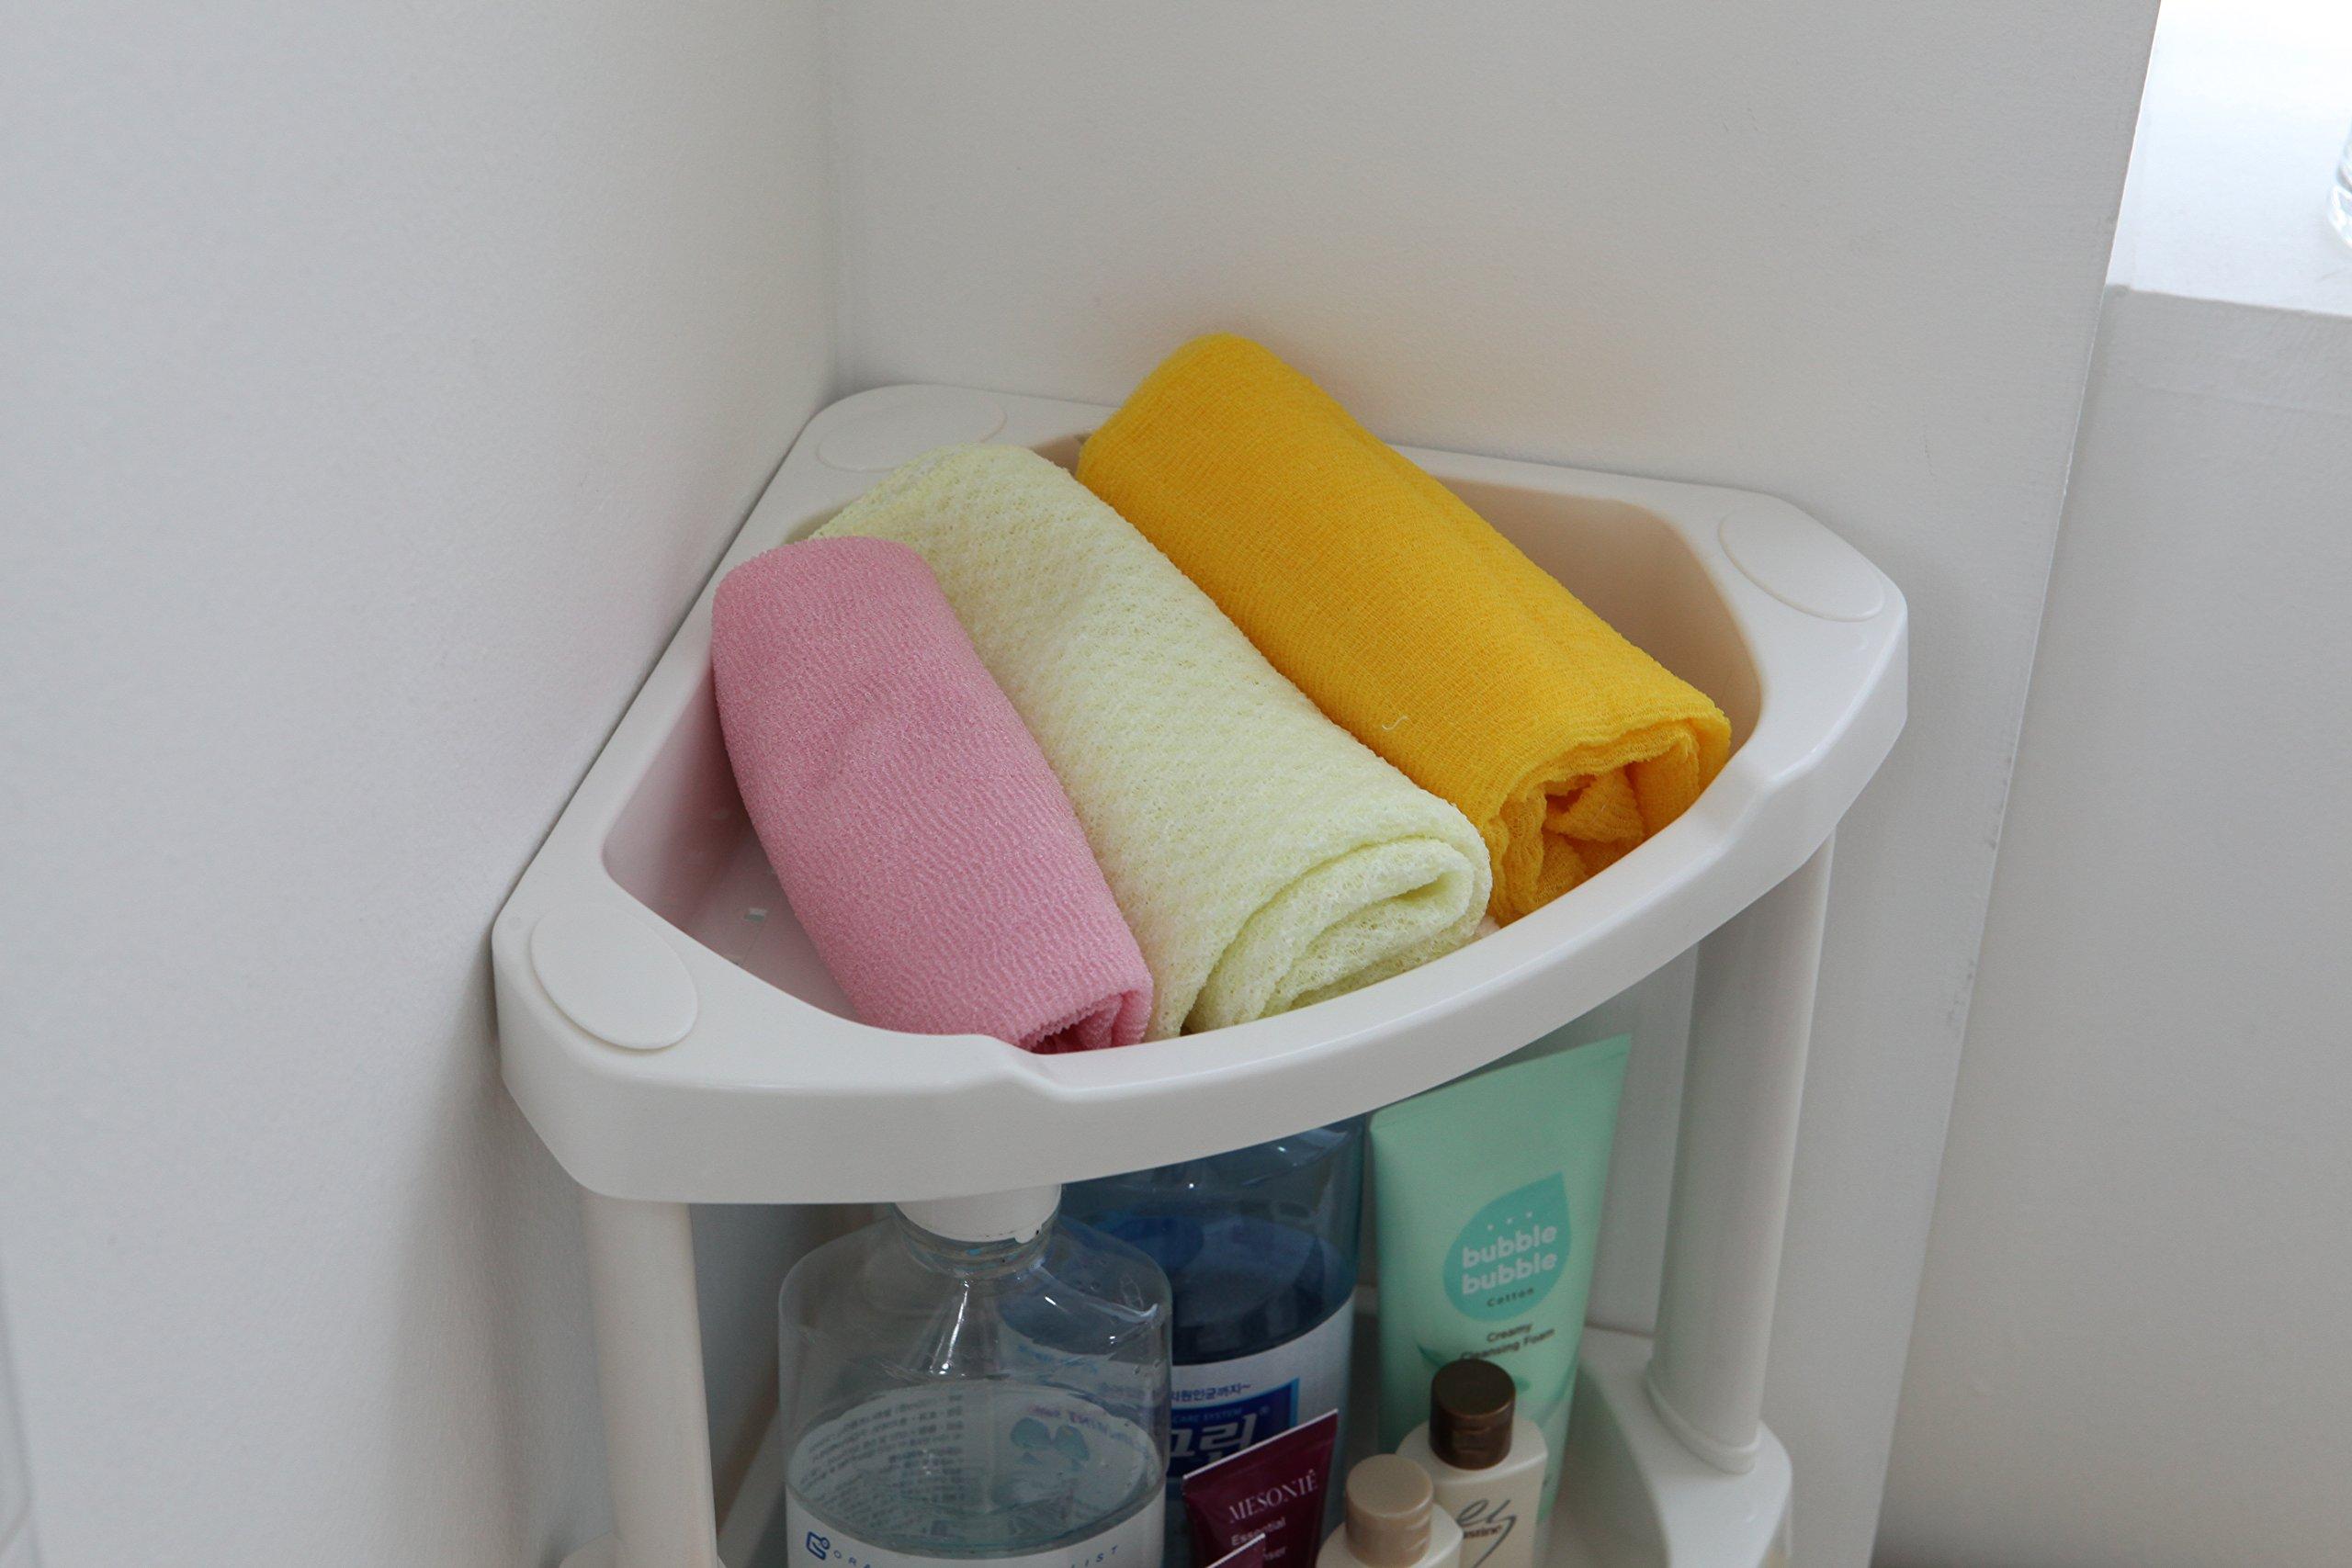 Tenby Living Corner Shower Caddy - 4 Shelf Shower Organizer Caddie with Movab. by Tenby Living